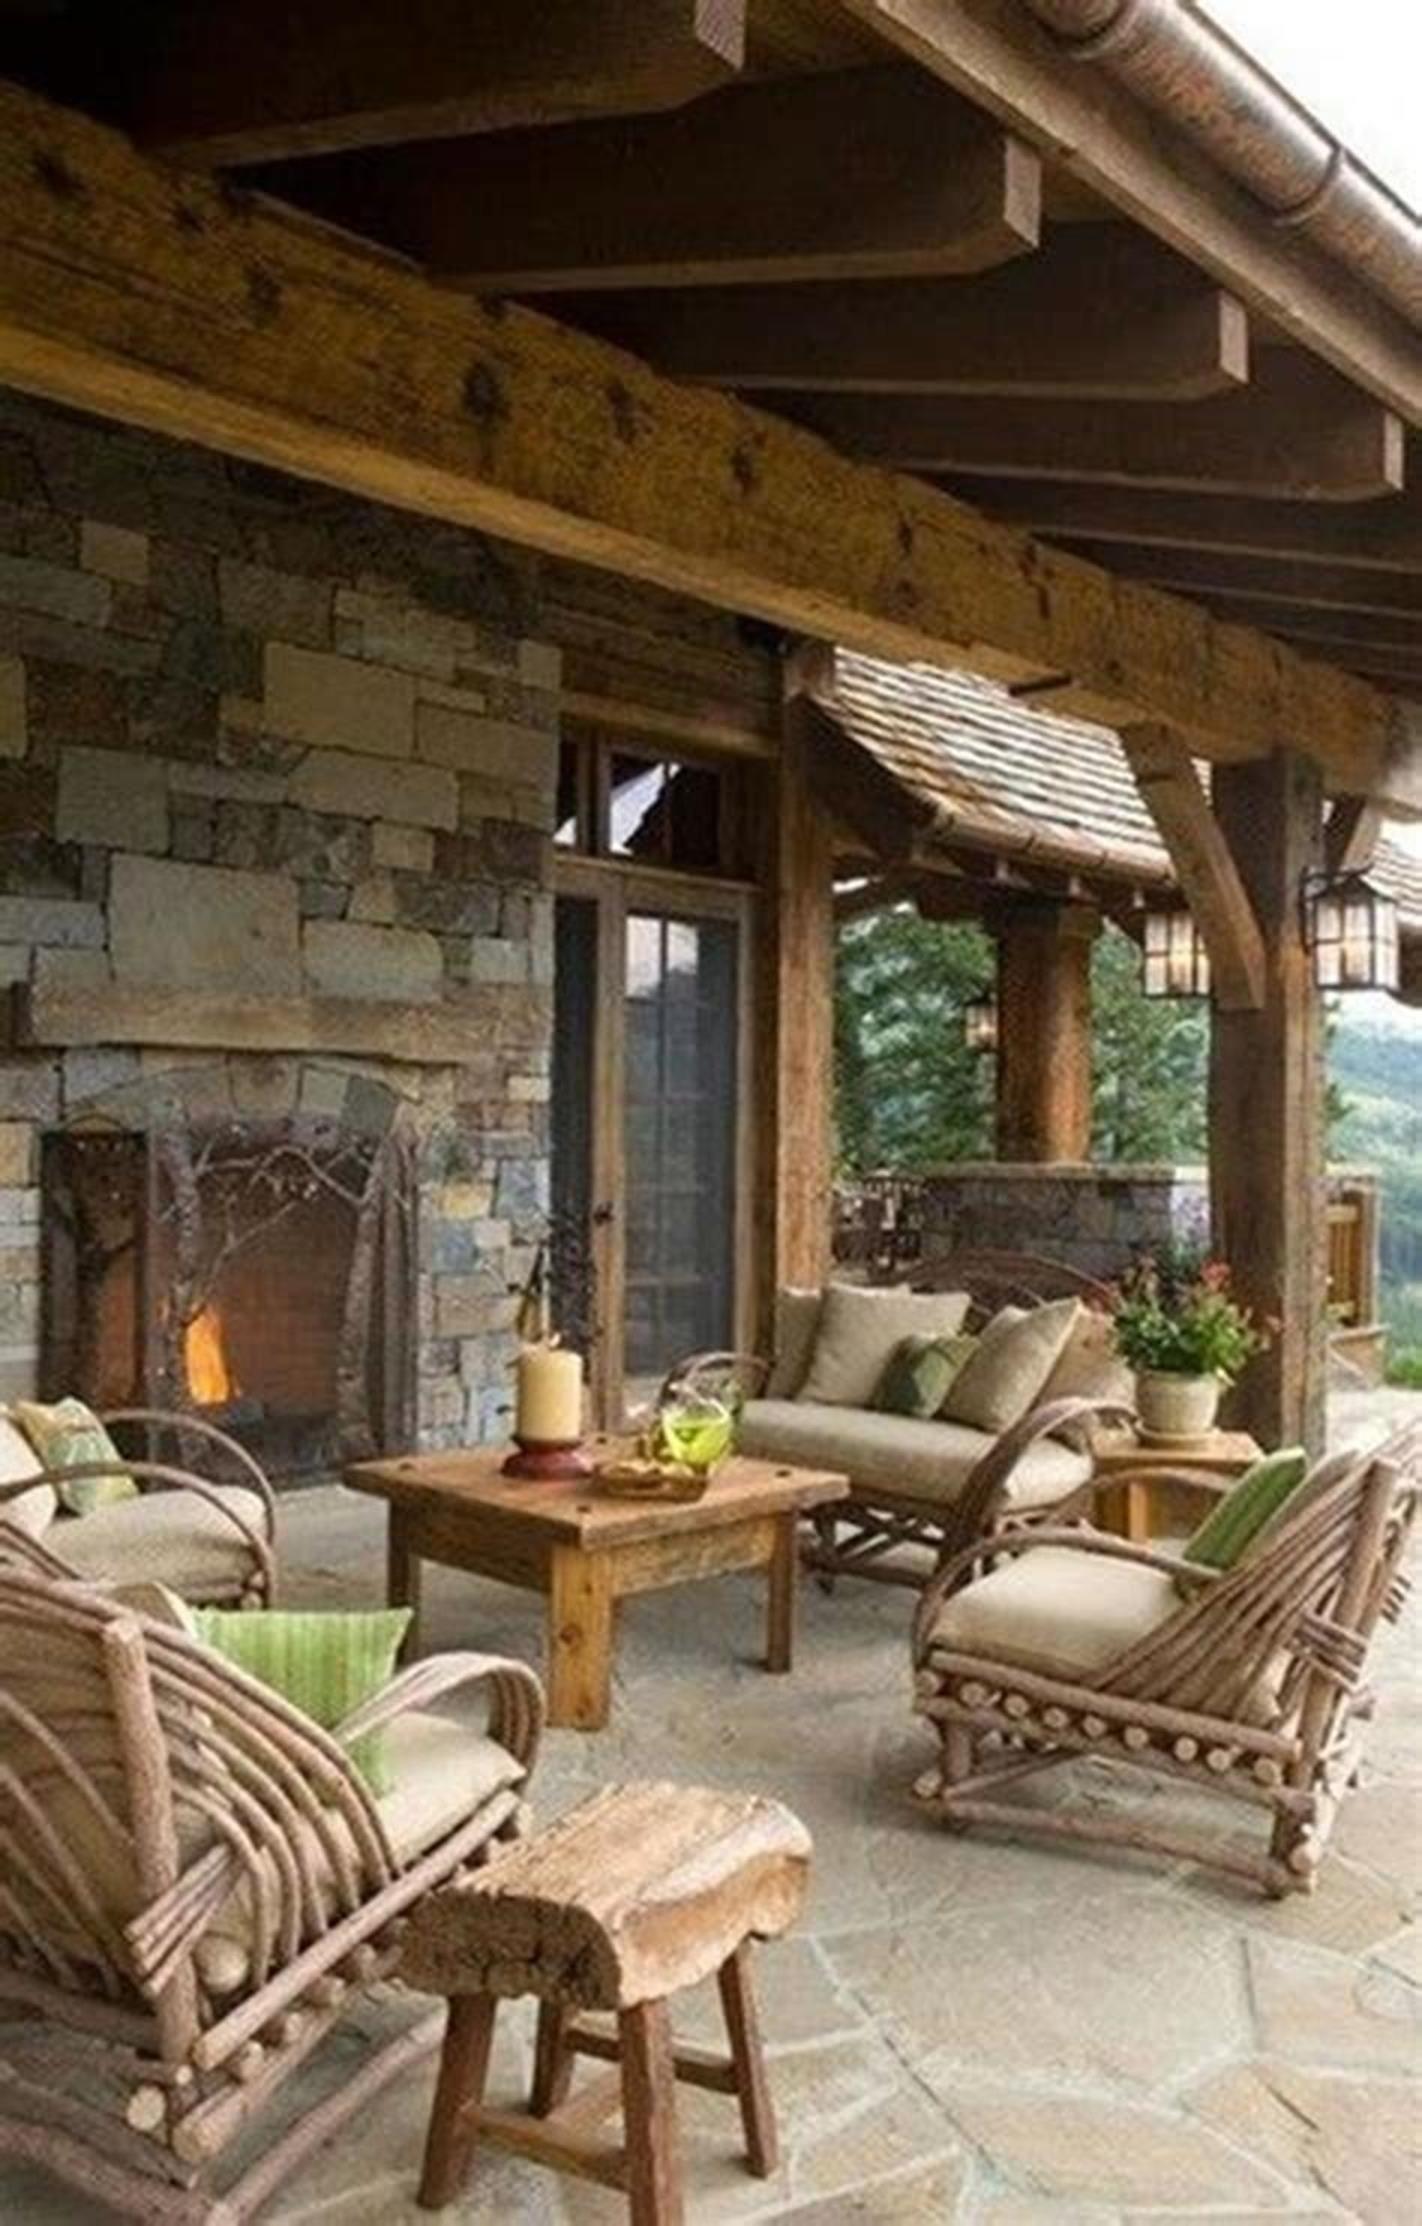 35 Best Rustic Porch Furniture Ideas You Will Love 33 in ...